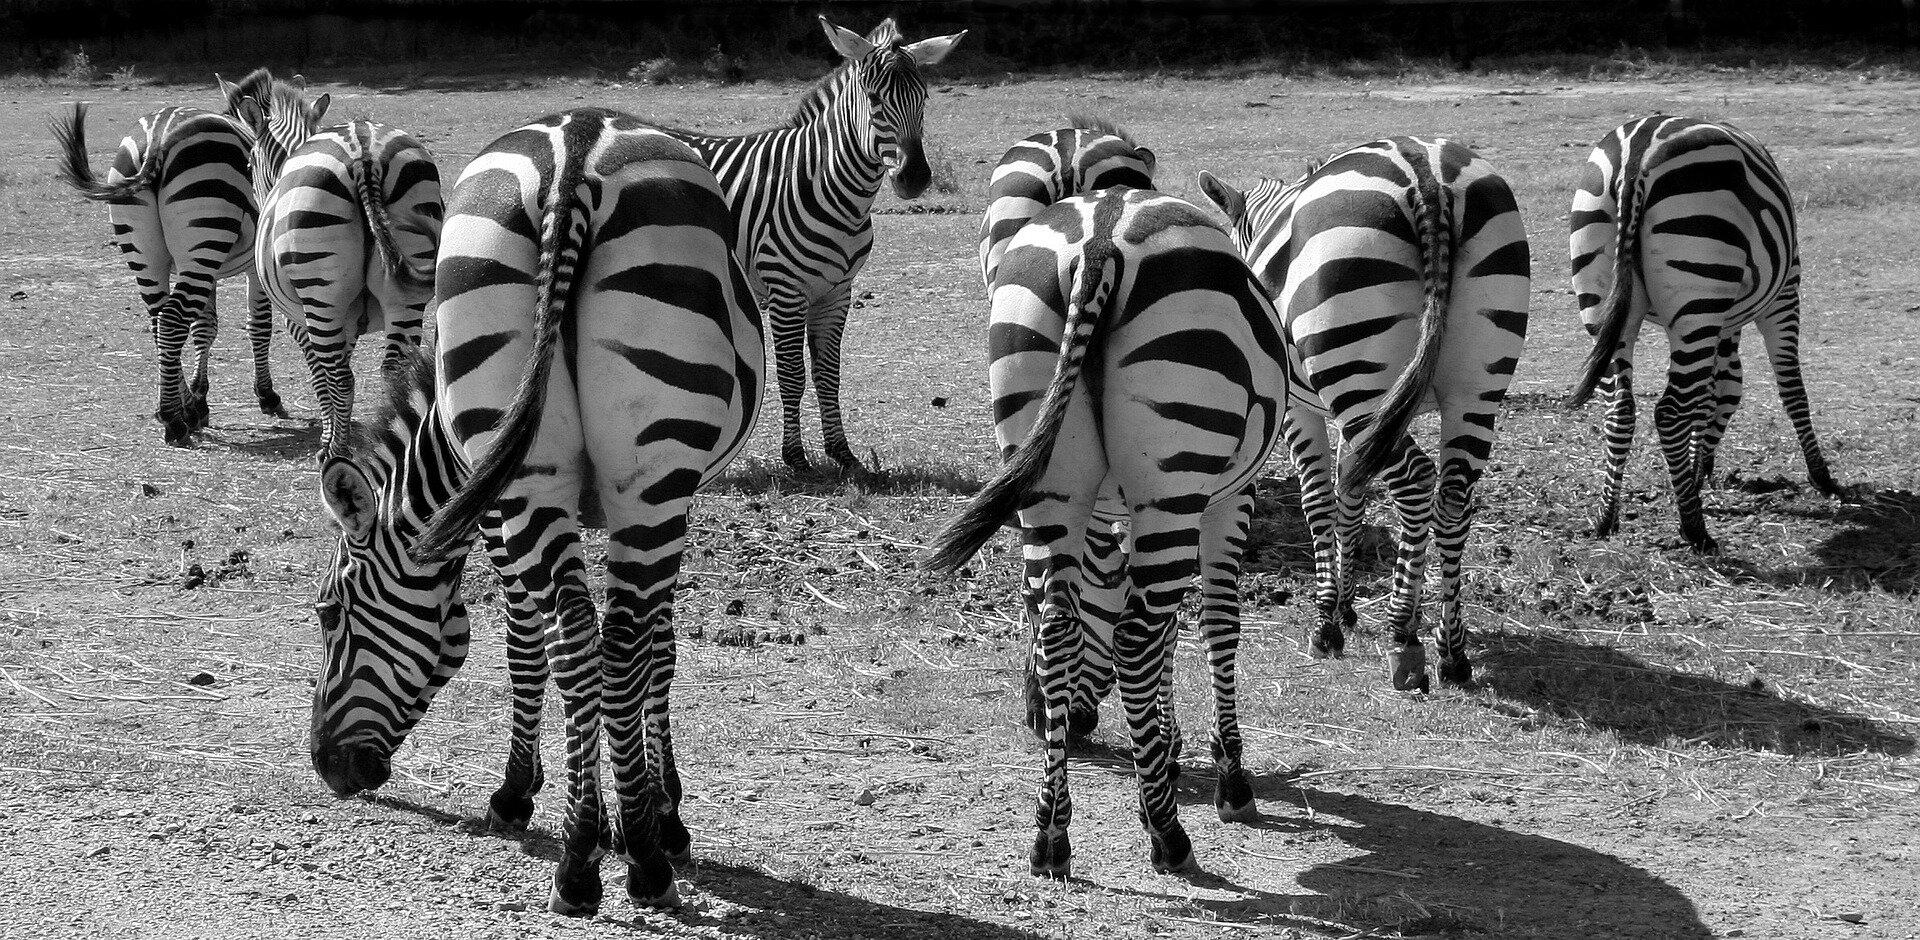 zebras-1081445_1920.jpg